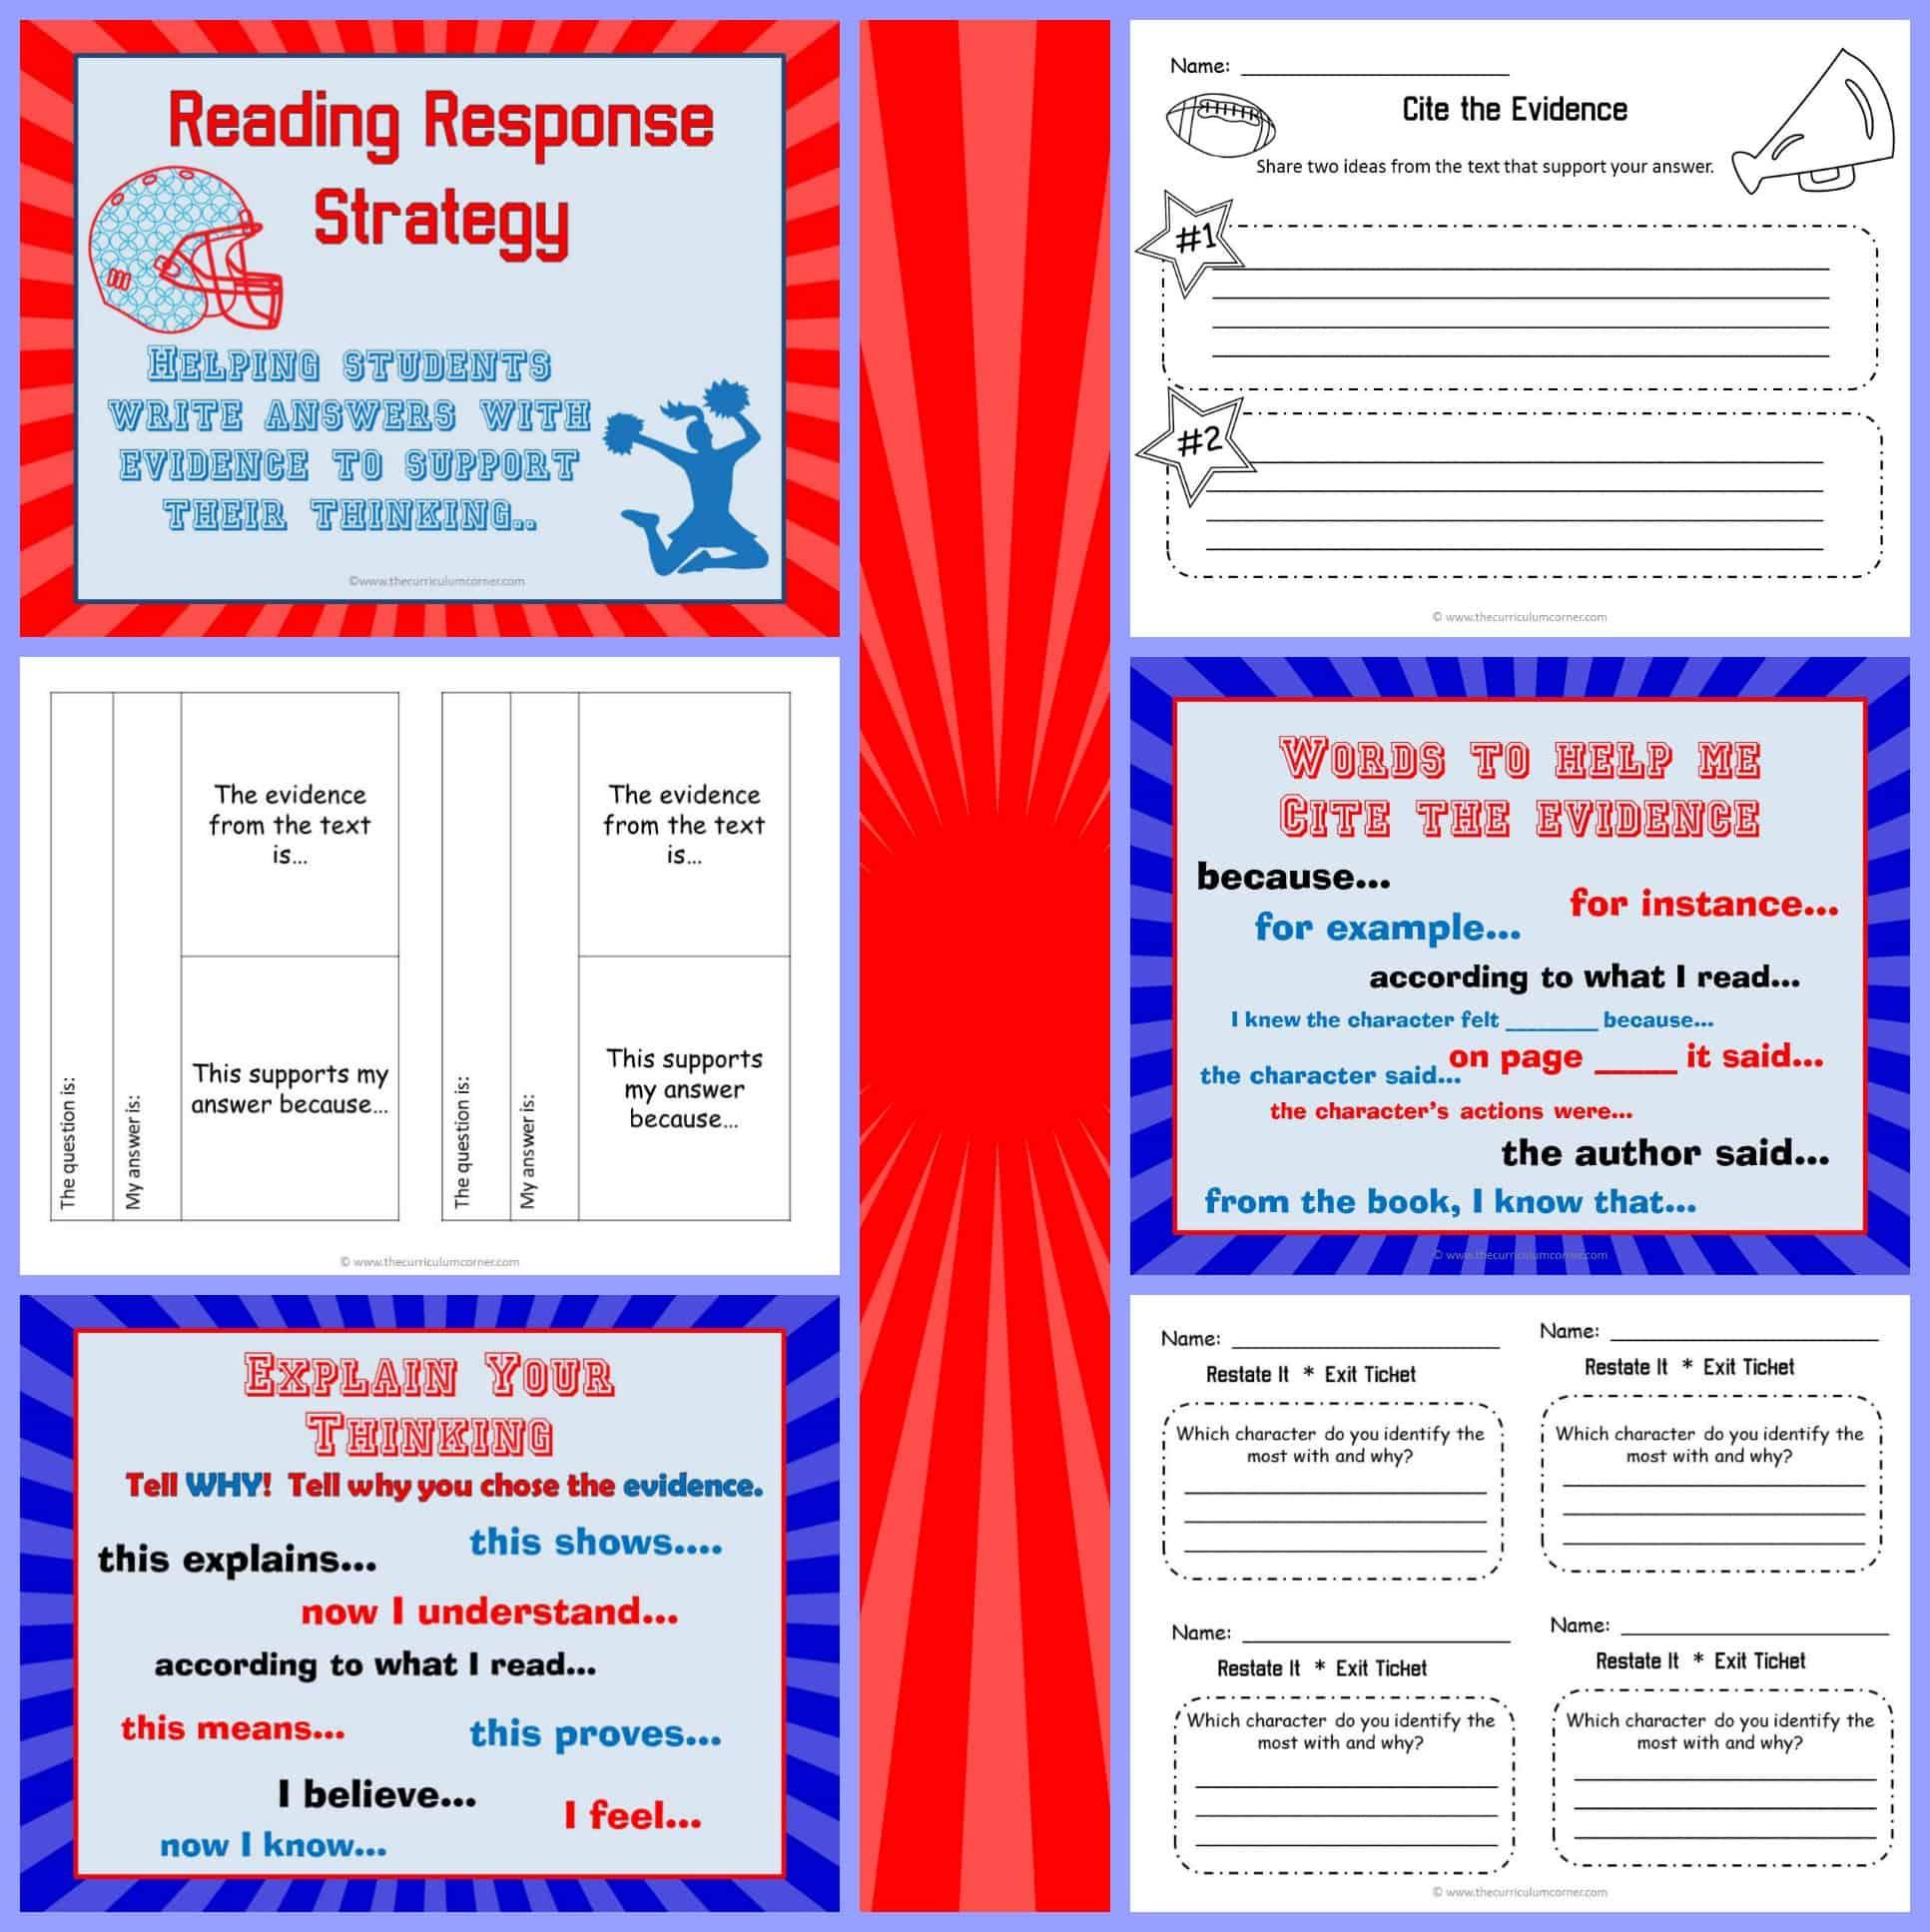 Reading Response Strategy